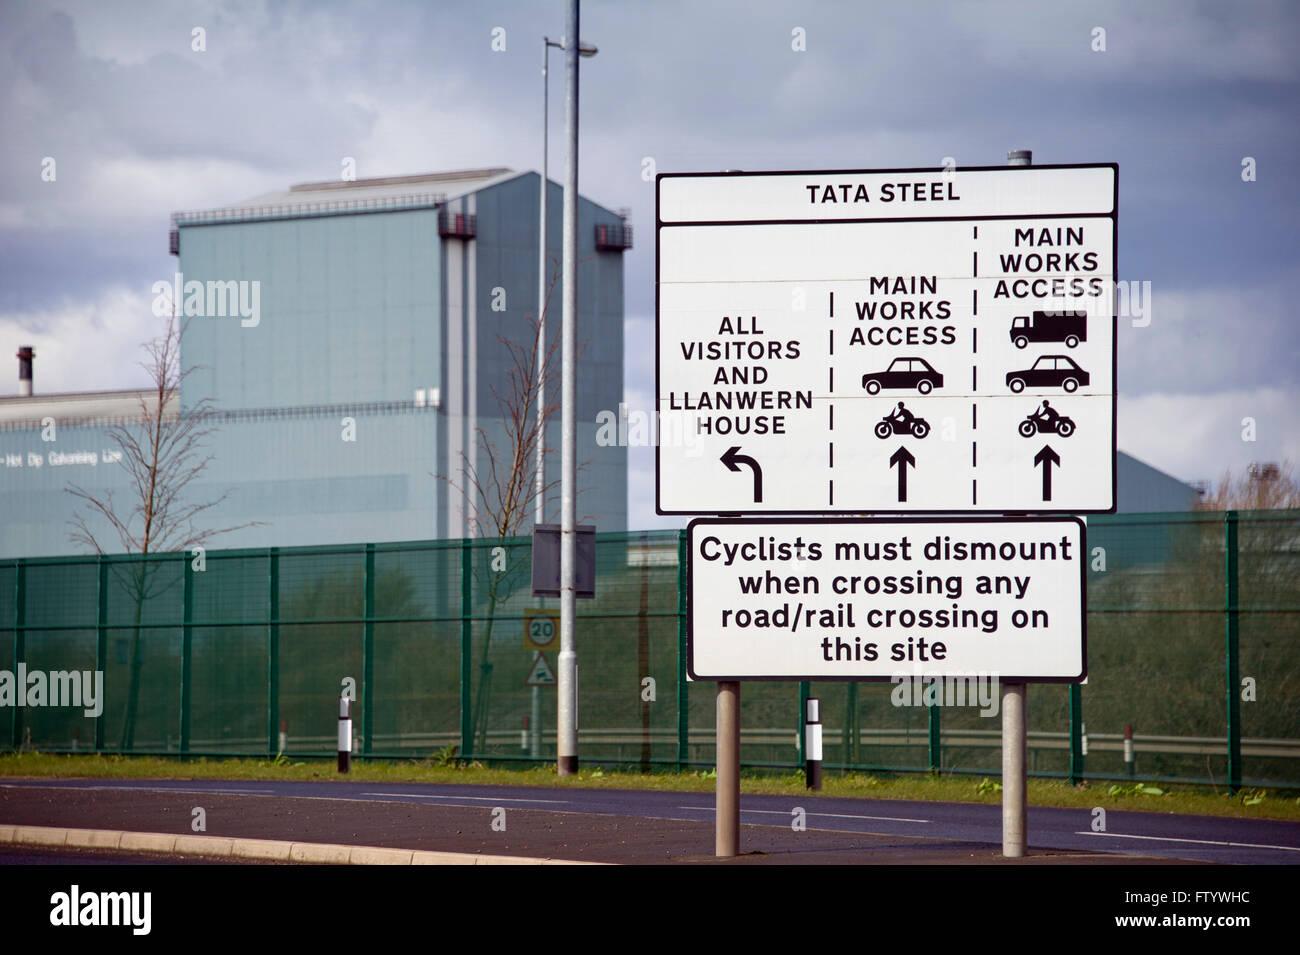 Tata Steel's steelworks at Llanwern, Newport,UK. a industry 'Port Talbot' 'Tata Group' - Stock Image